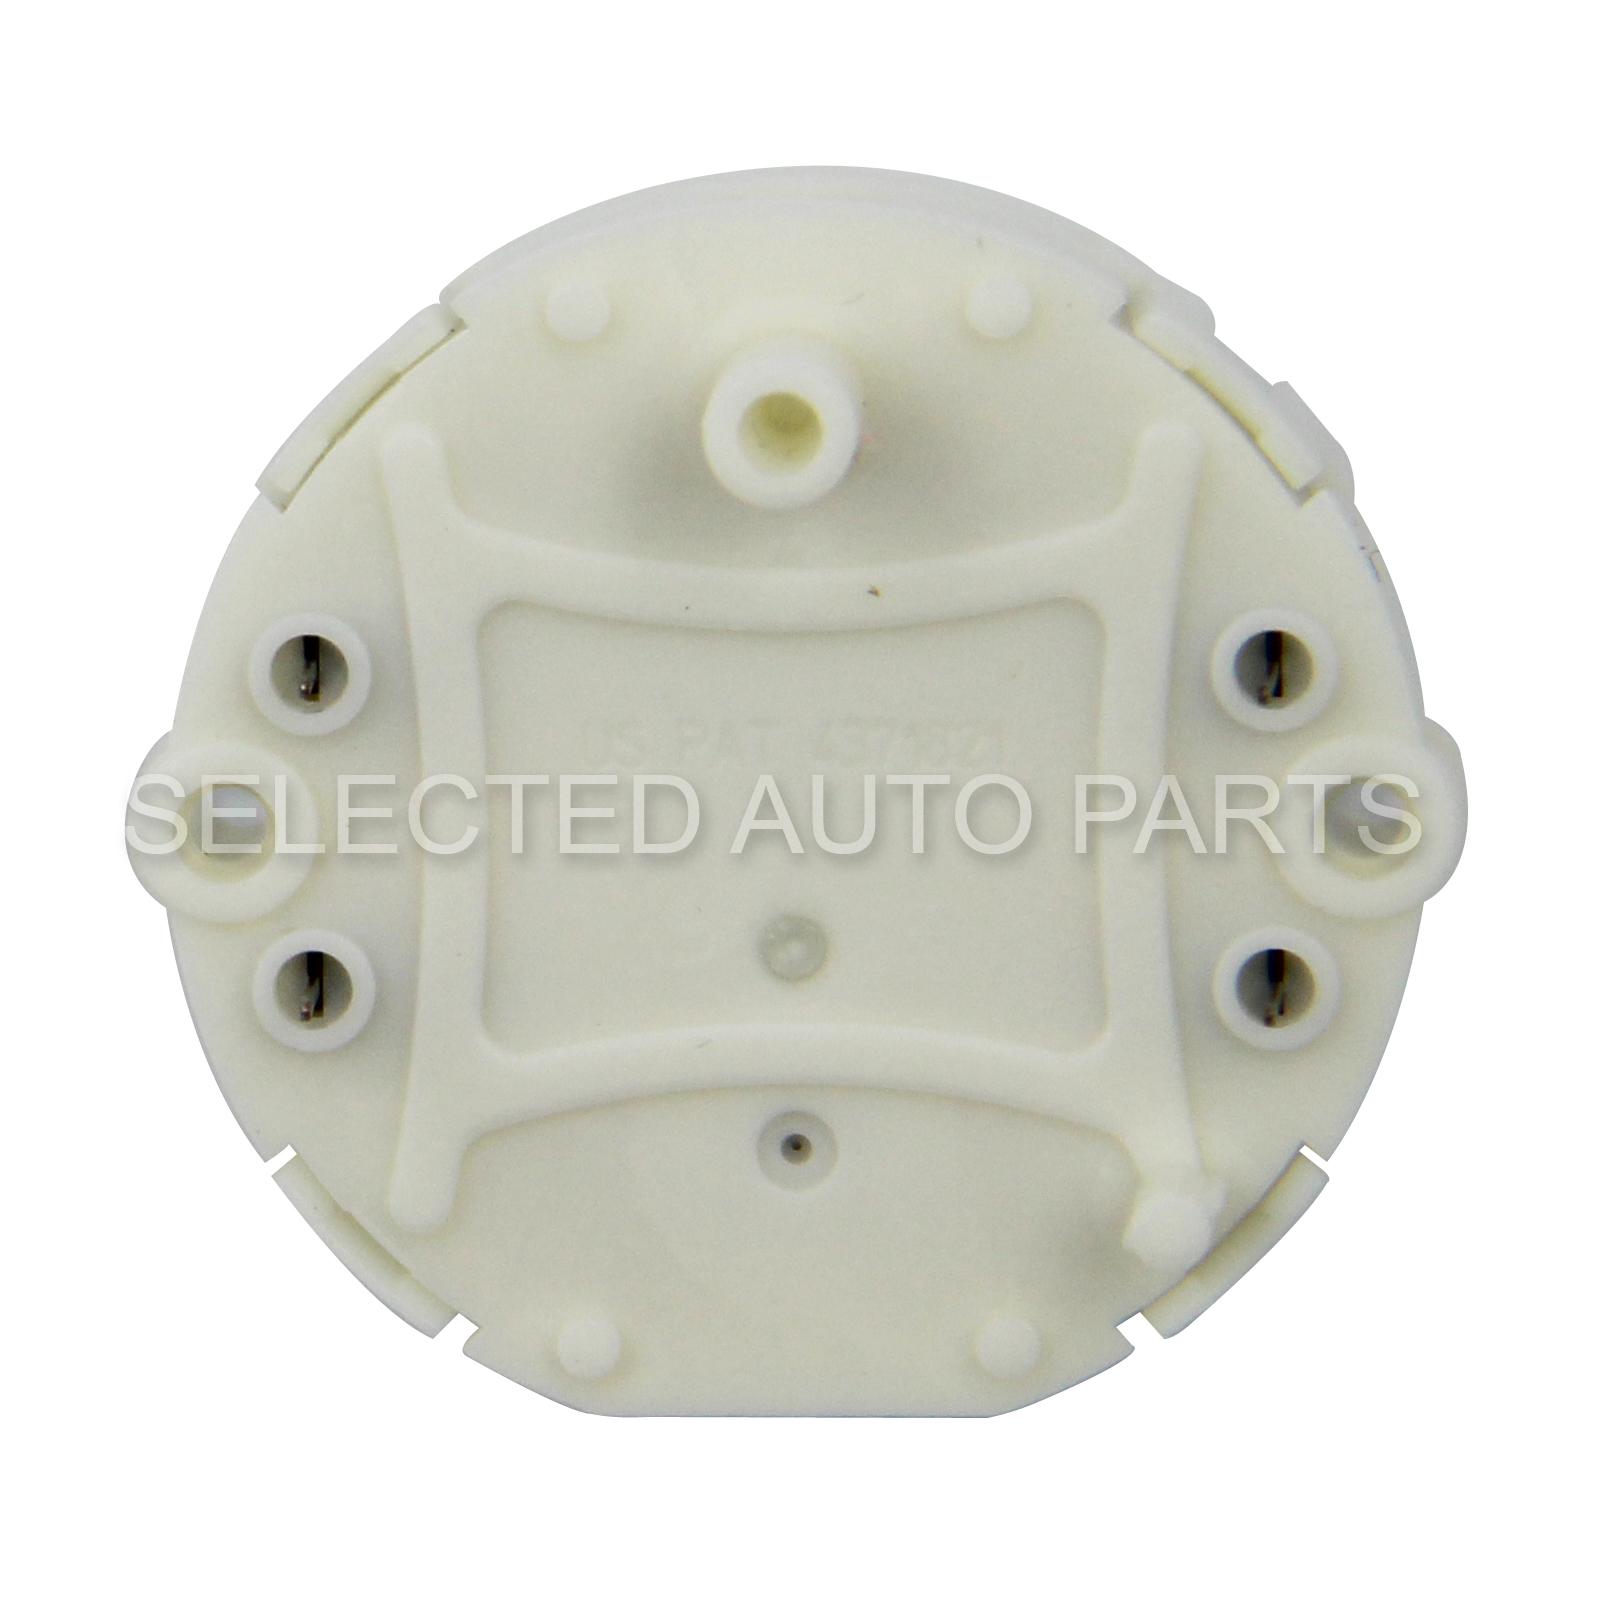 6 gm gmc speedometer gauge replacement cluster repair kit for 2004 silverado stepper motor